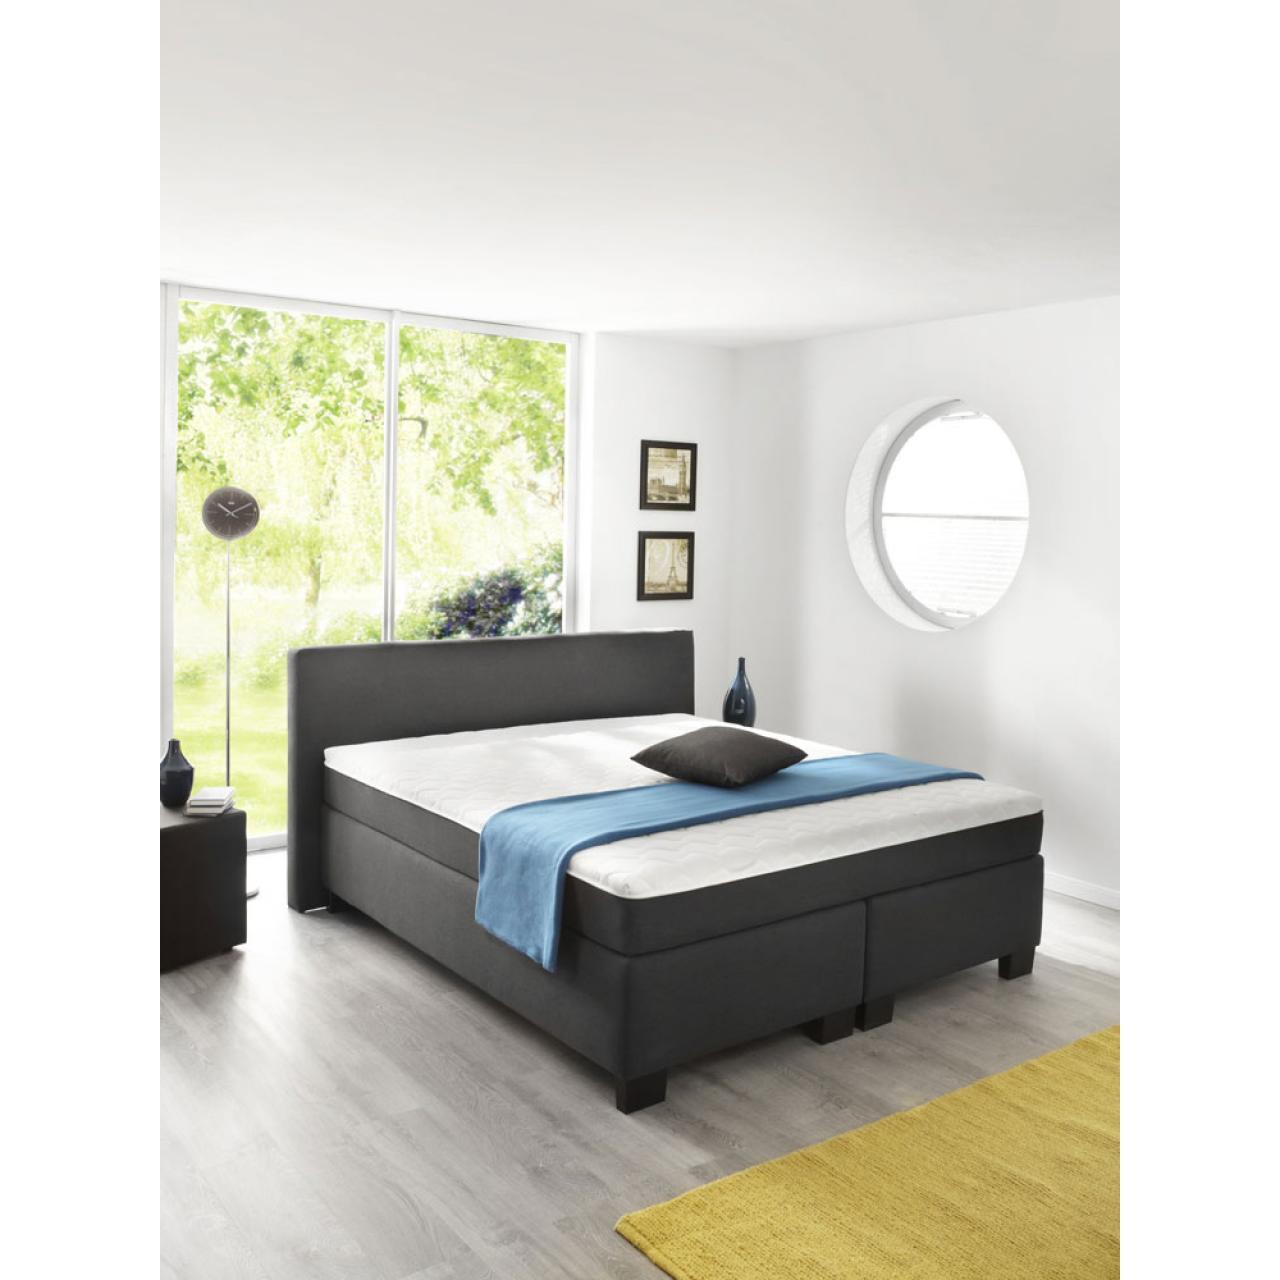 boxspringbett bx290 180x200 cm boxspringbett betten schlafen m bel j hnichen center gmbh. Black Bedroom Furniture Sets. Home Design Ideas